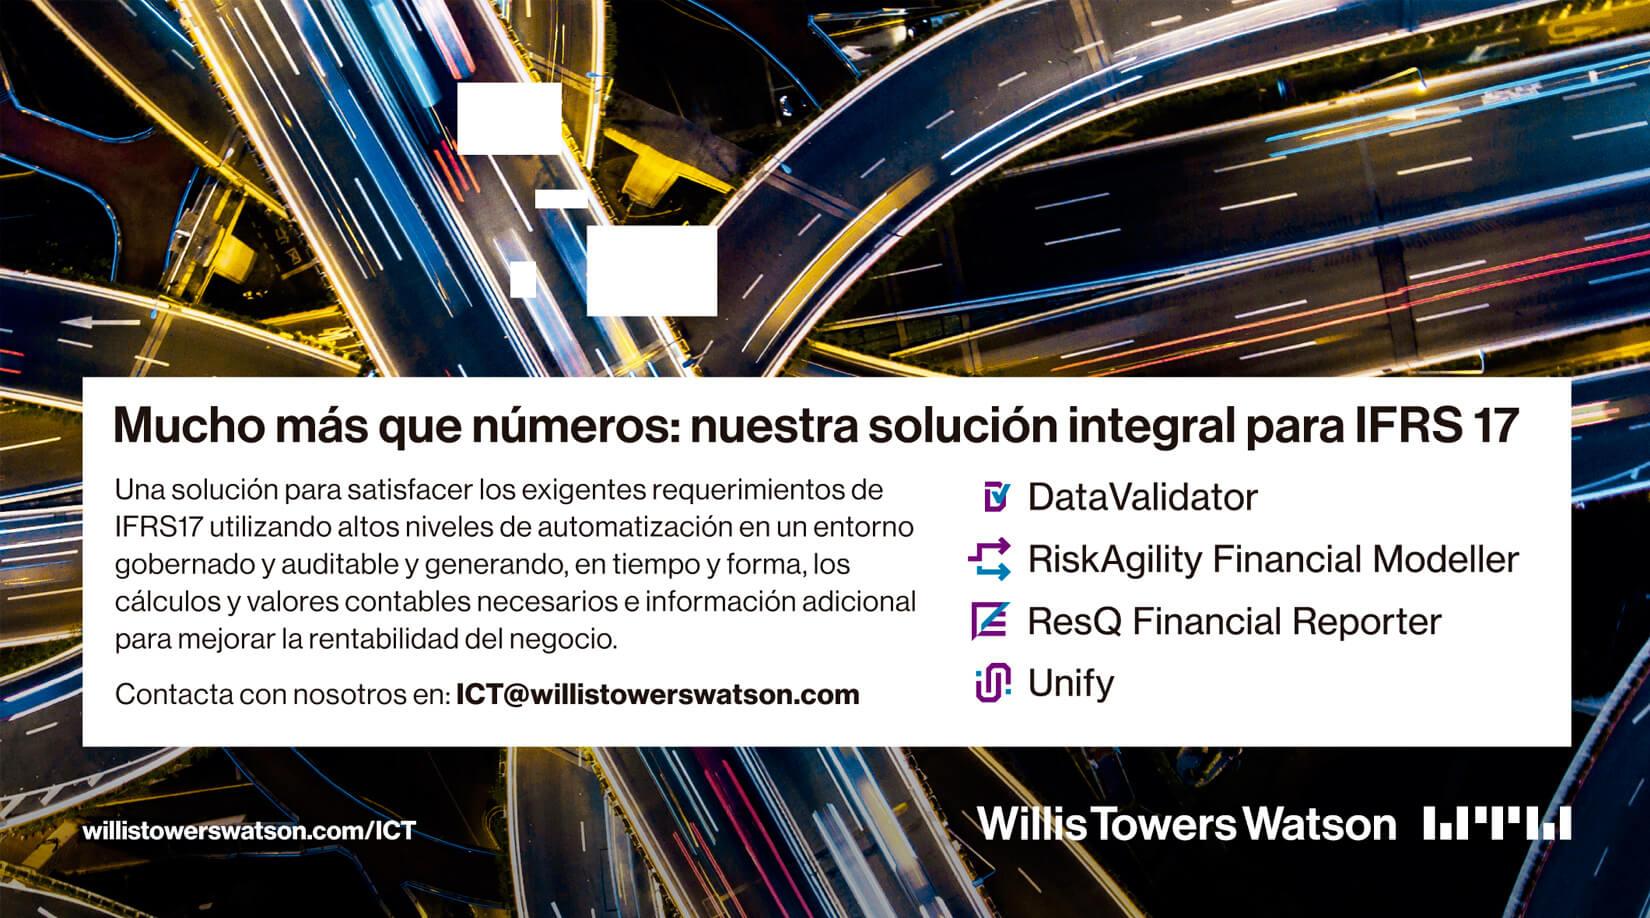 Willis Towers Watson. Unify.